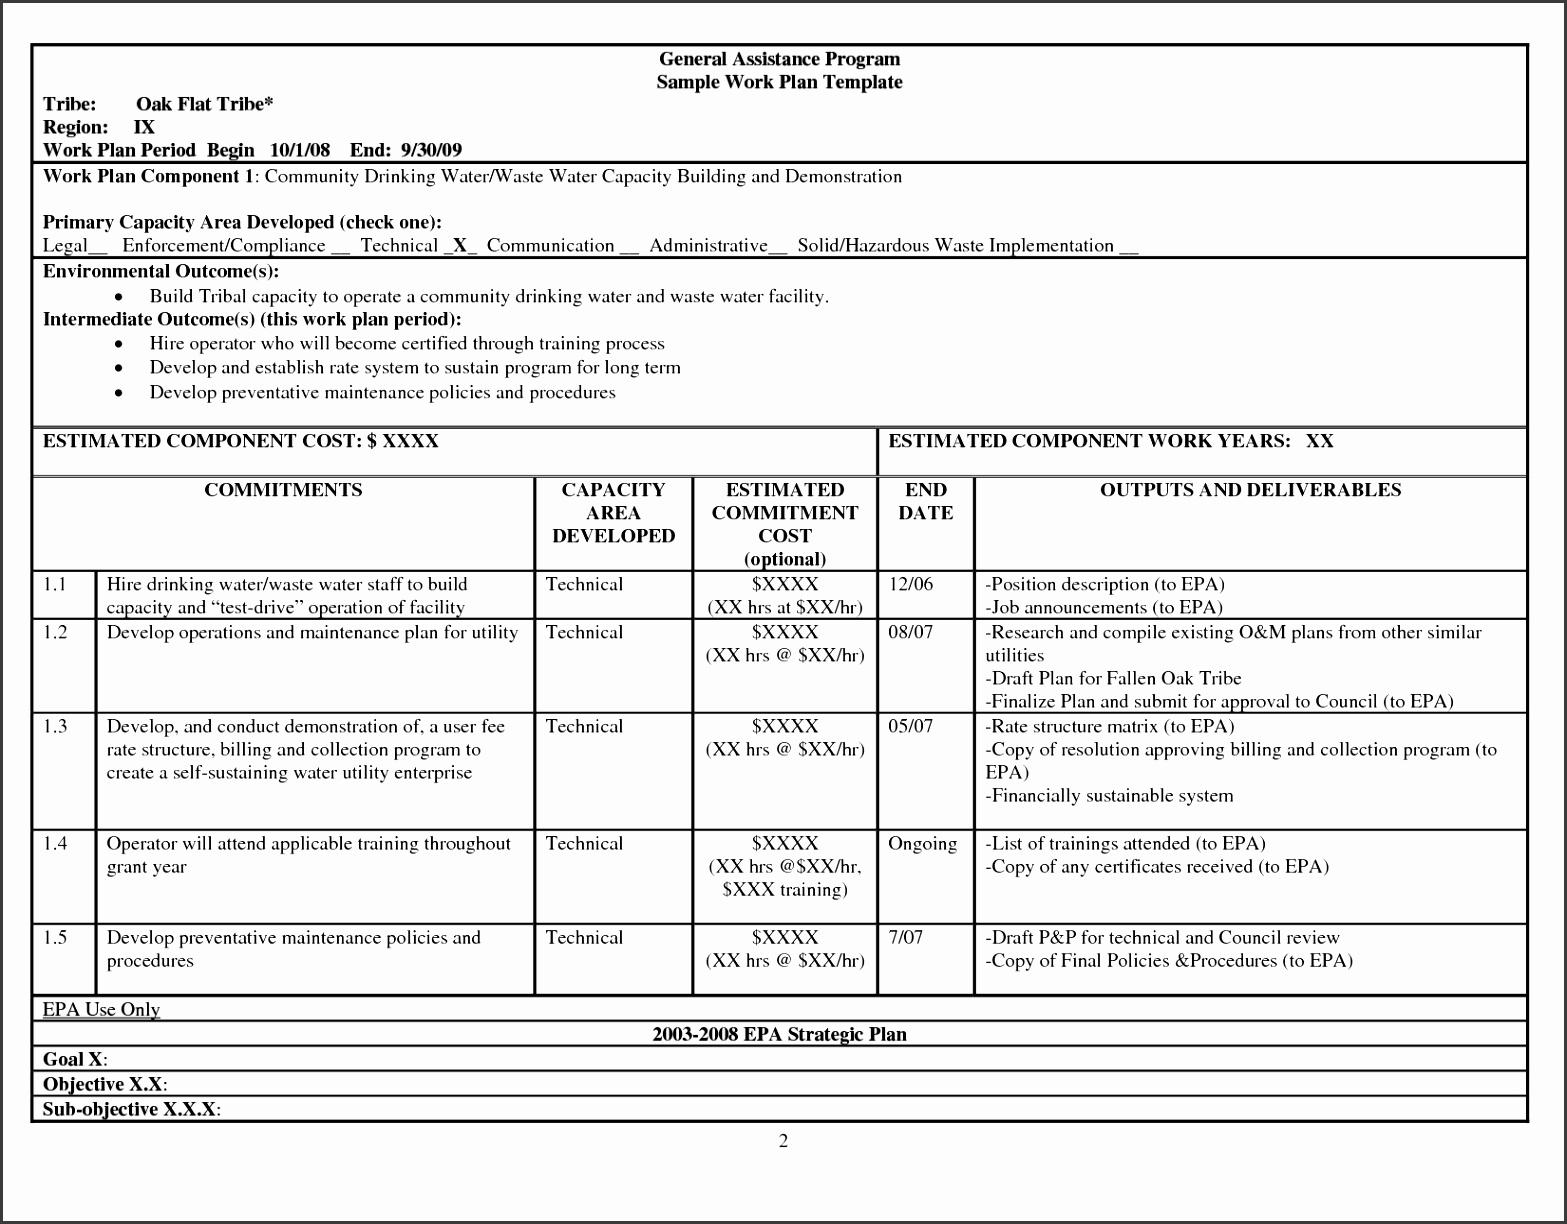 Sample Program Work Plan